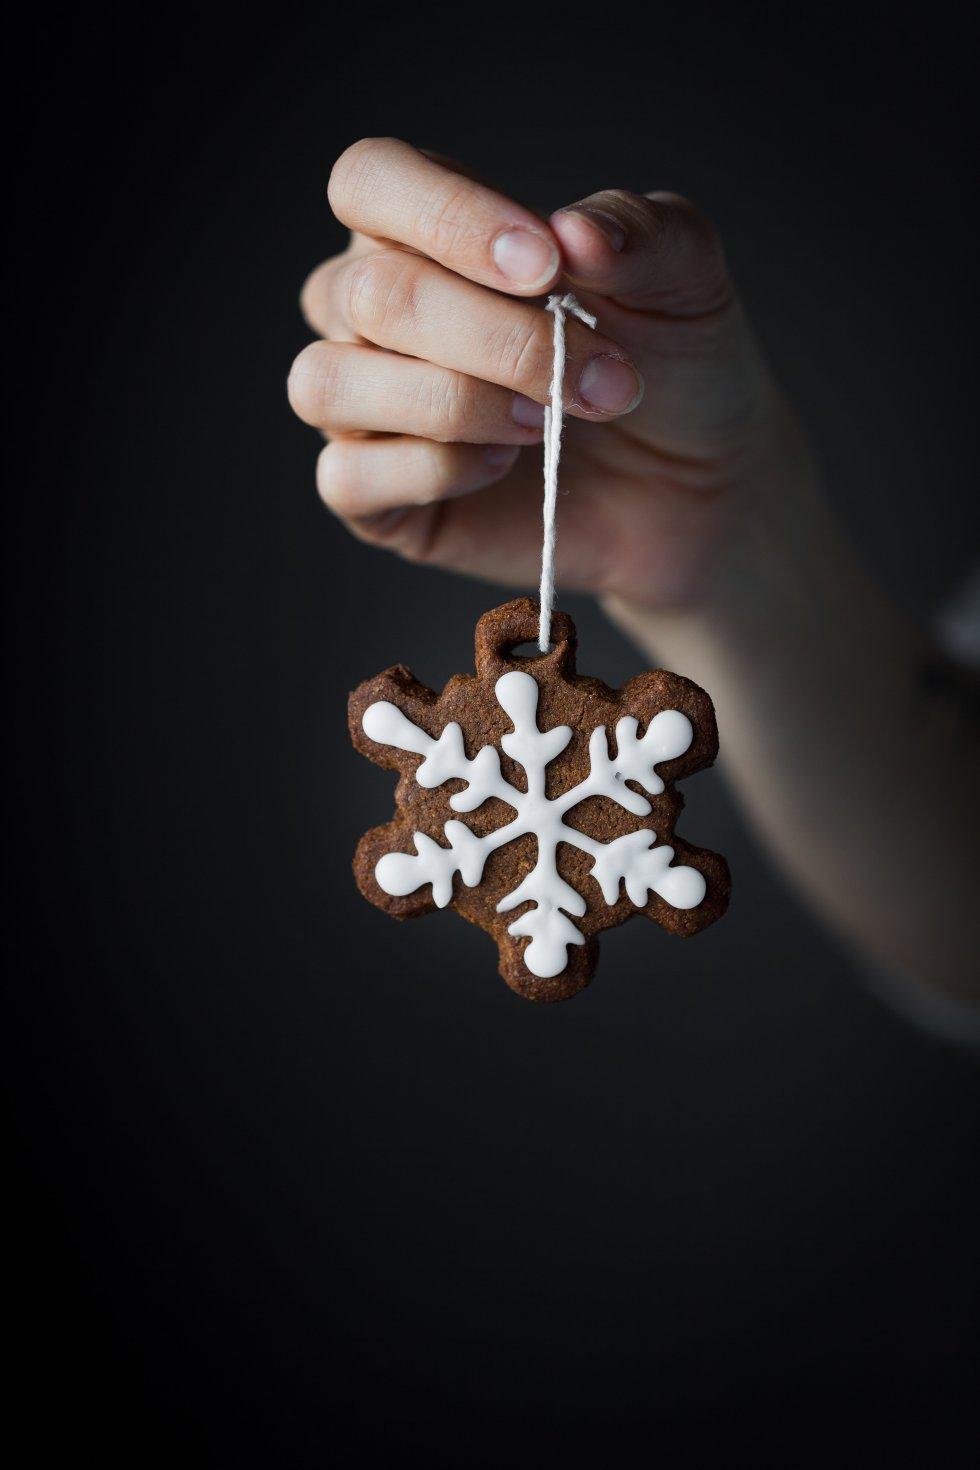 Edible Gingerbread Cookie Ornaments [vegan]